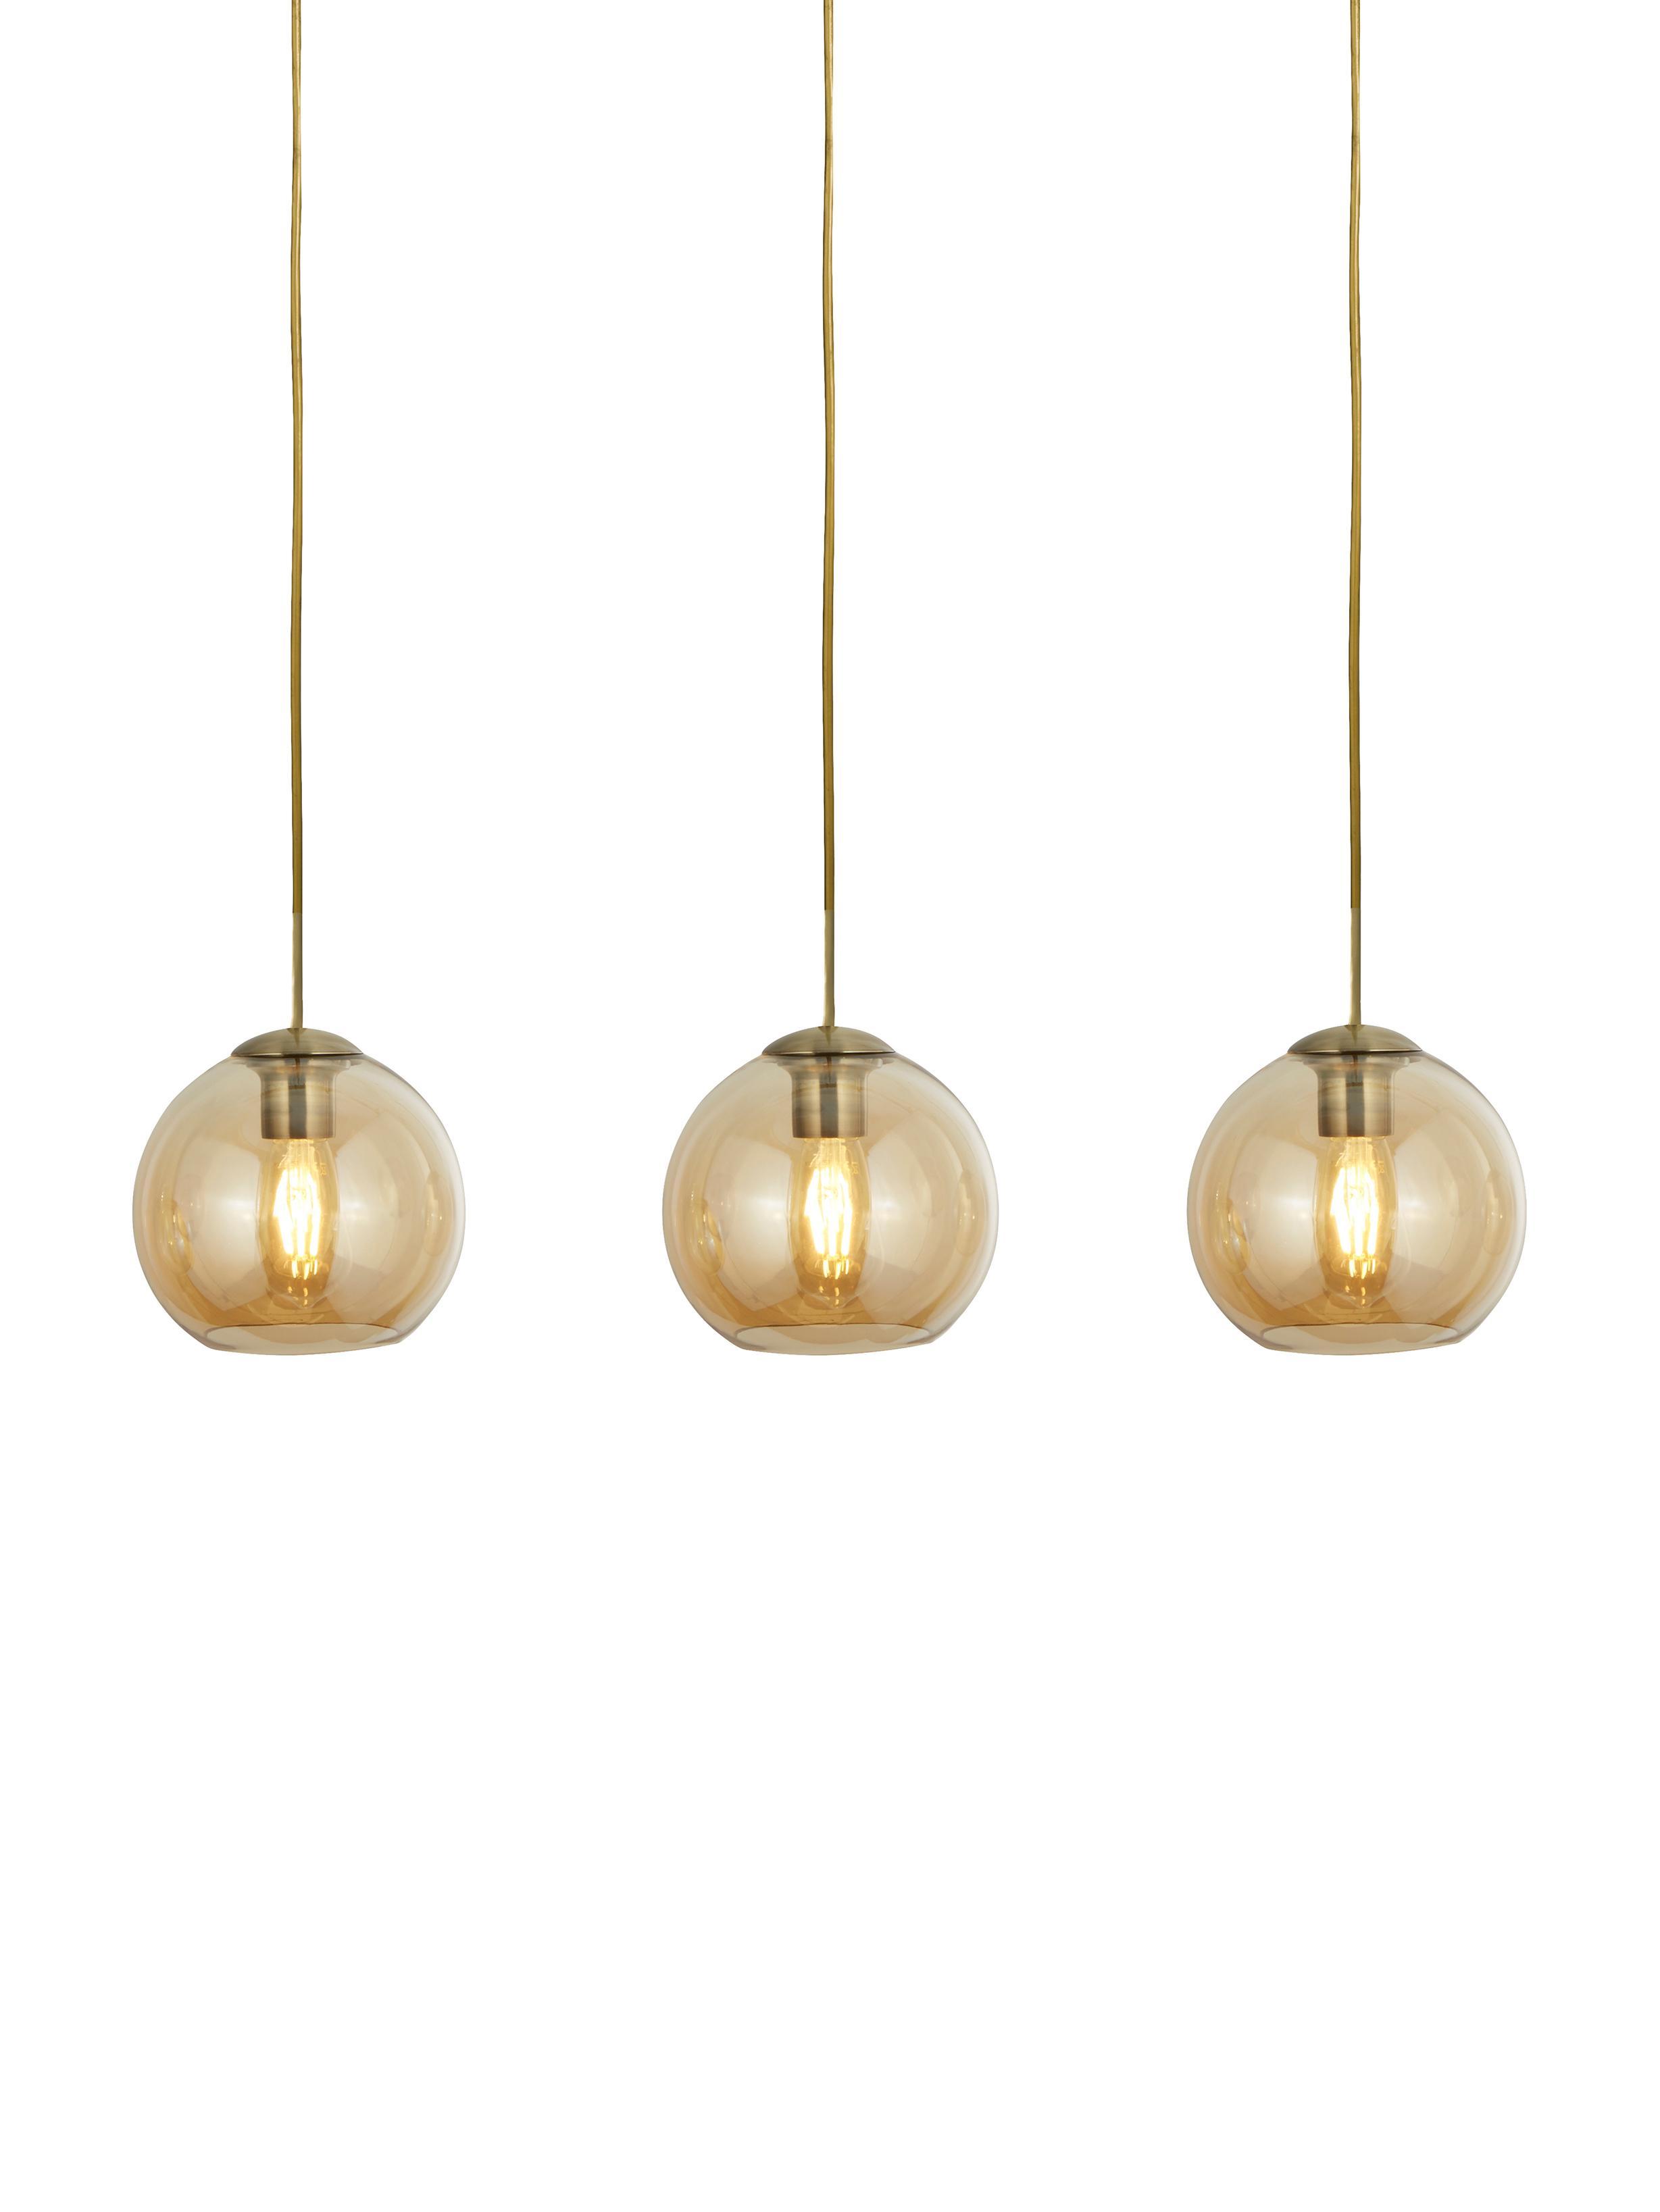 Hanglamp Zoe, Gecoat metaal, glas, Goudkleurig, amberkleurig, transparant, 70 x 20 cm